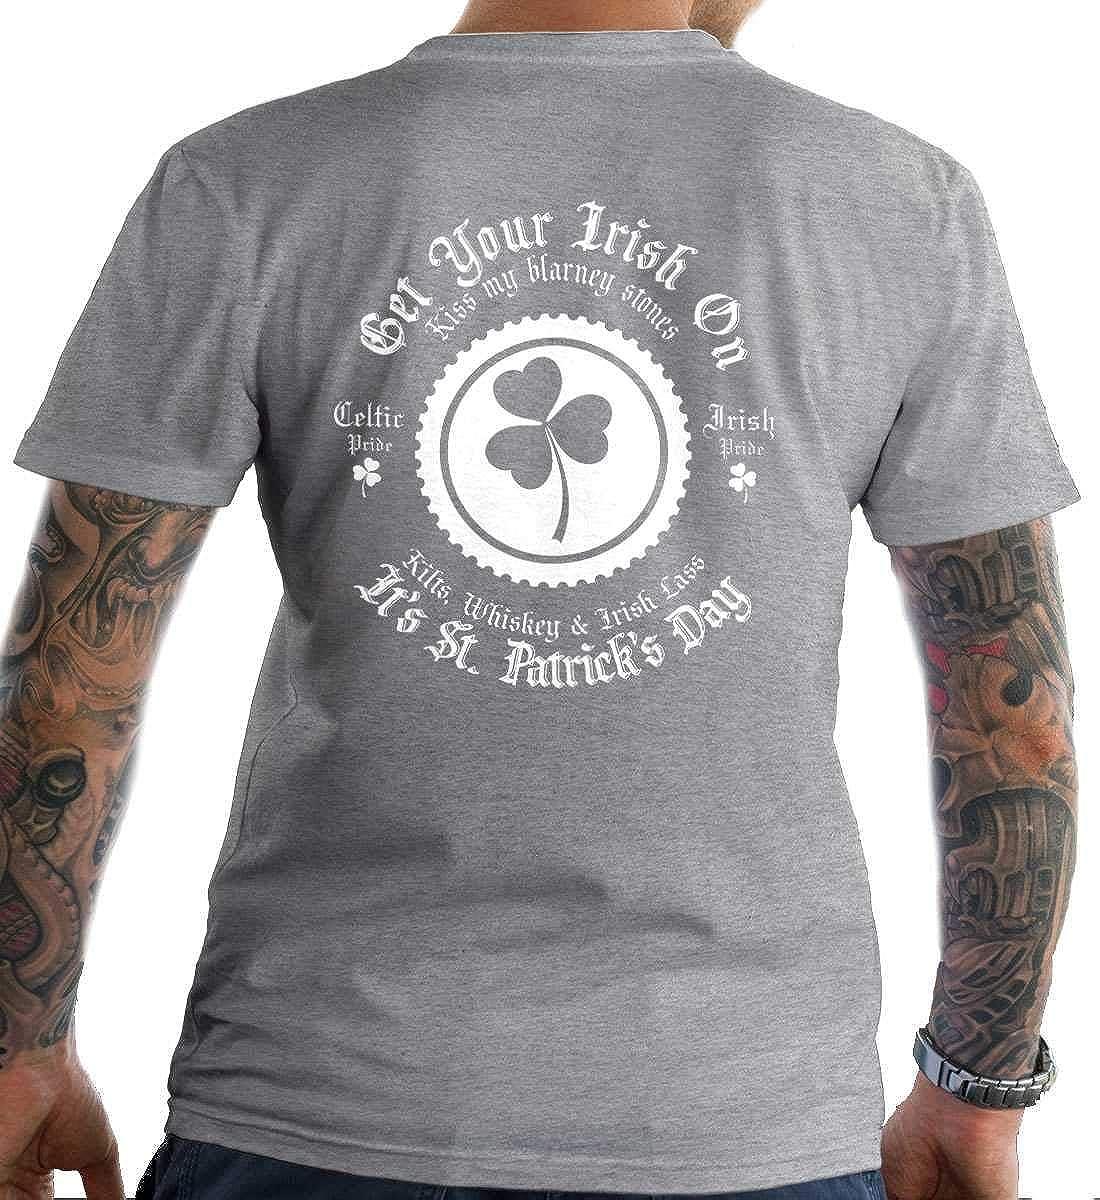 Its St Irish T-Shirt Patricks Day Made in USA T-Shirt. Get Your Irish On